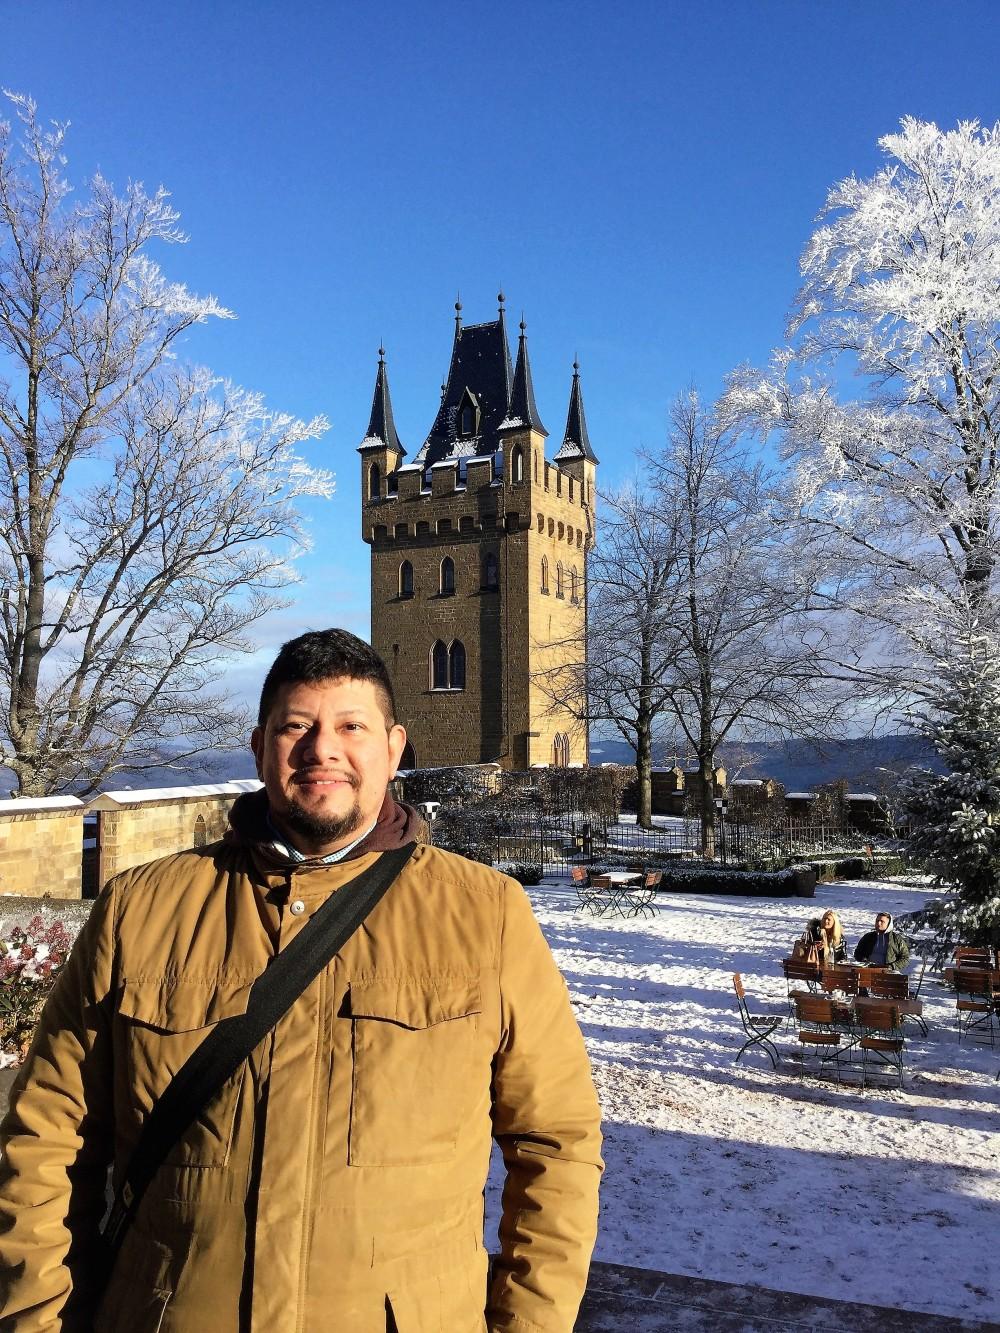 Castillo-de-Hohenzollern-donviajon-viajando-con-pasion-turismo-cultural-de-invierno-baden-wurttemberg-alemania